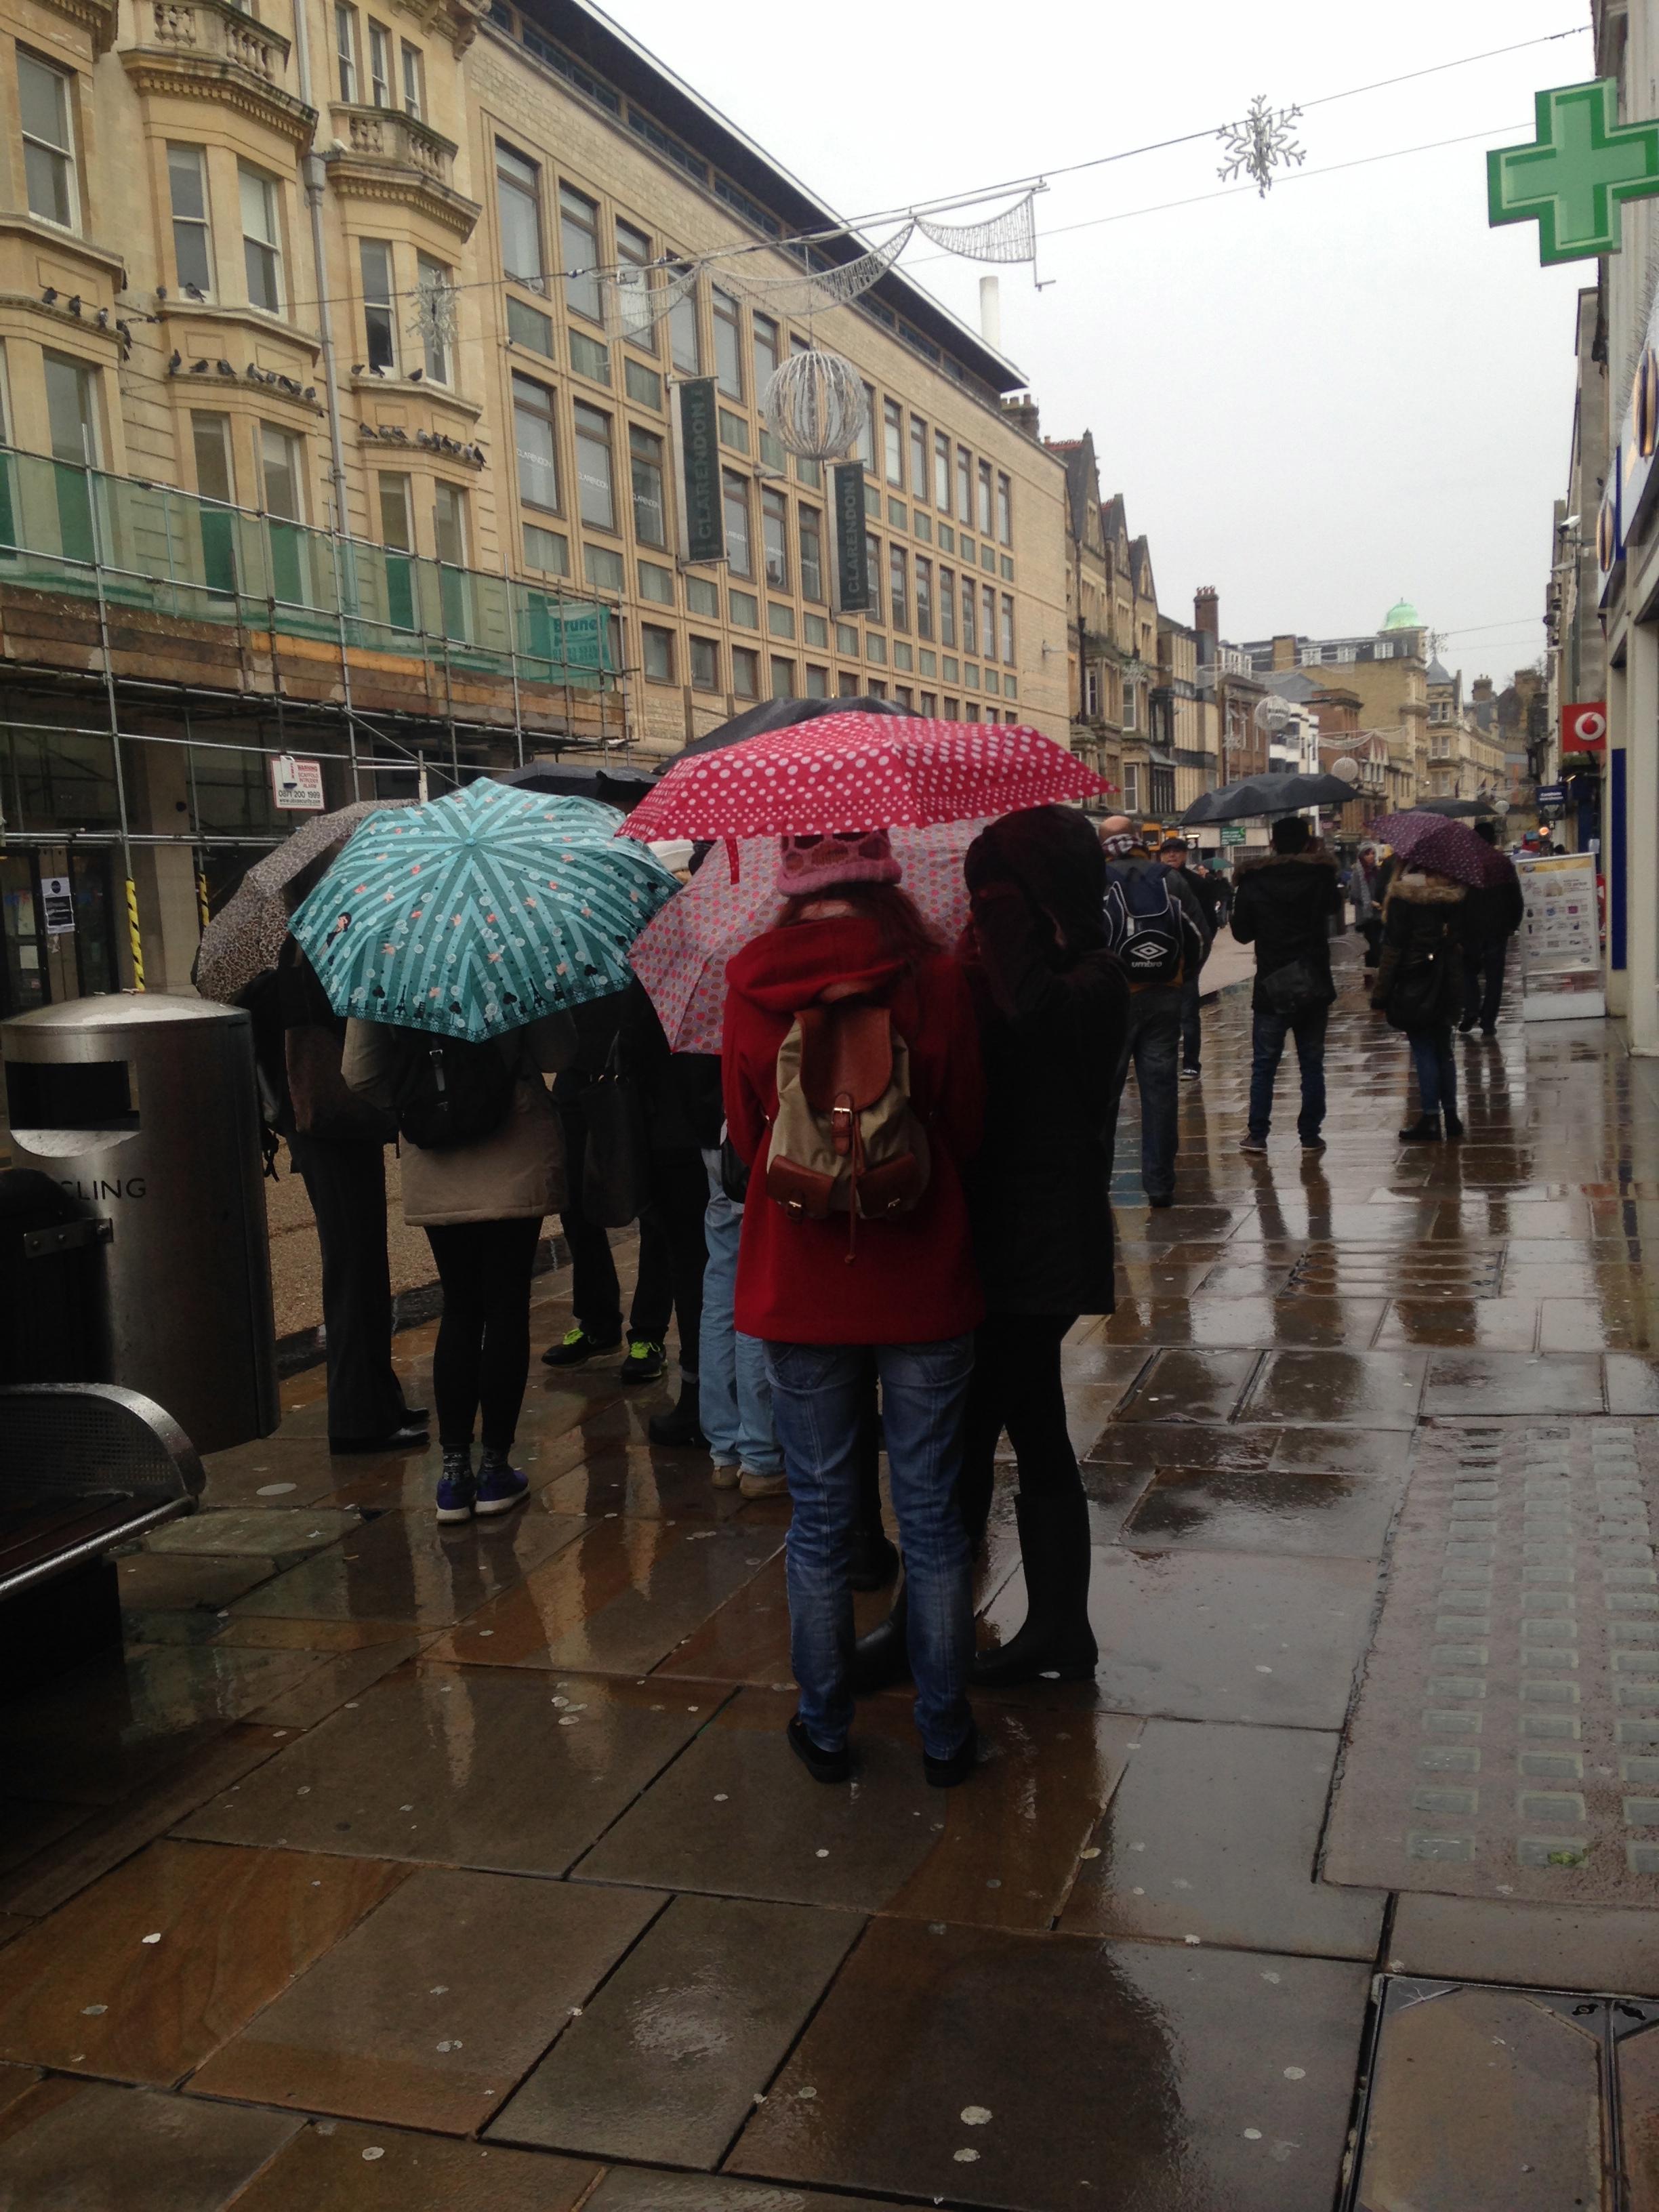 Hurrah for umbrellas!